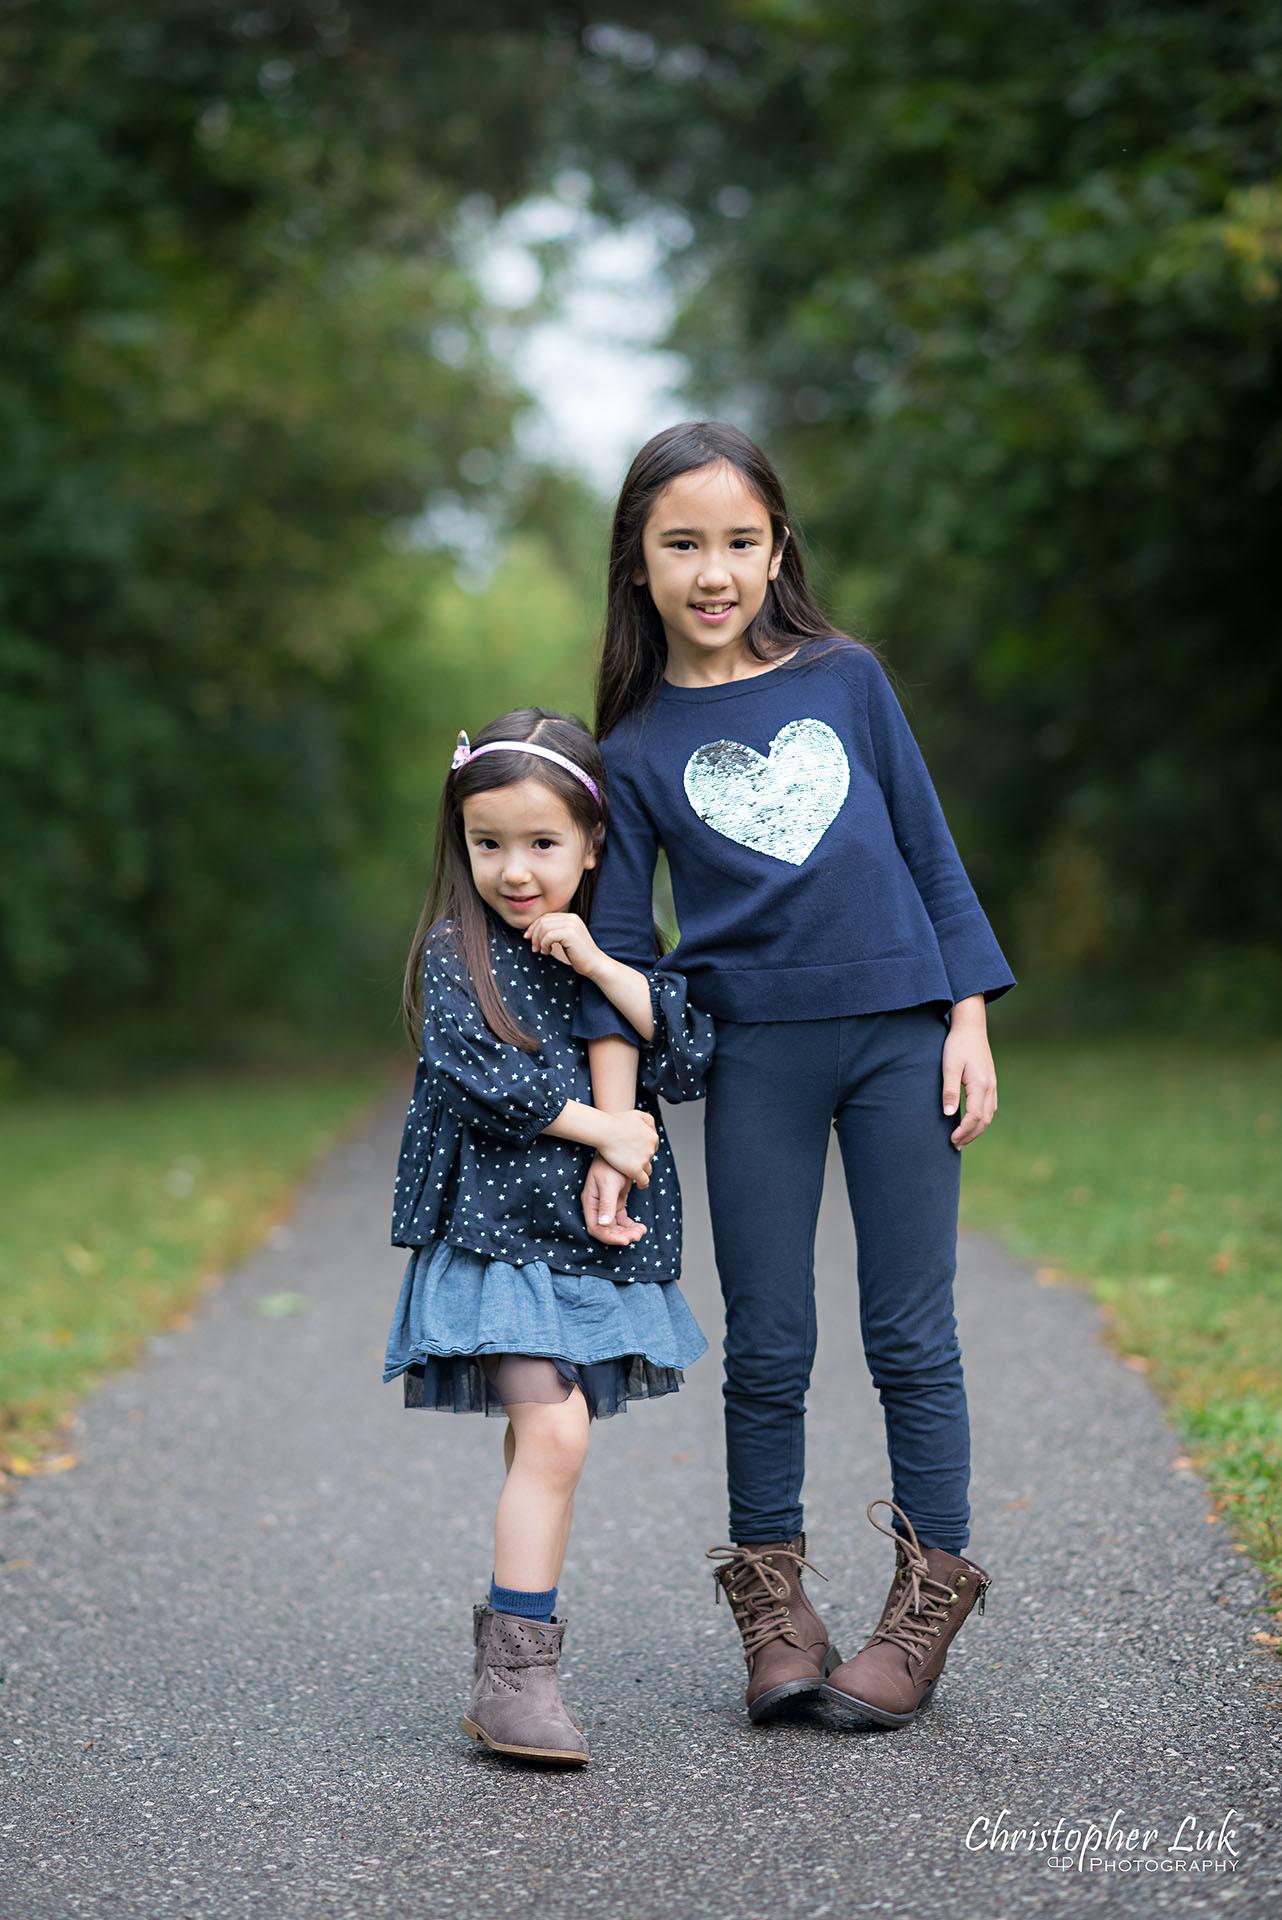 Christopher Luk Family Photographer Toronto Markham Candid Natural Photojournalistic Daughters Sisters Sisterhood Smile Hug Hugging Holding Arms Cute Adorable